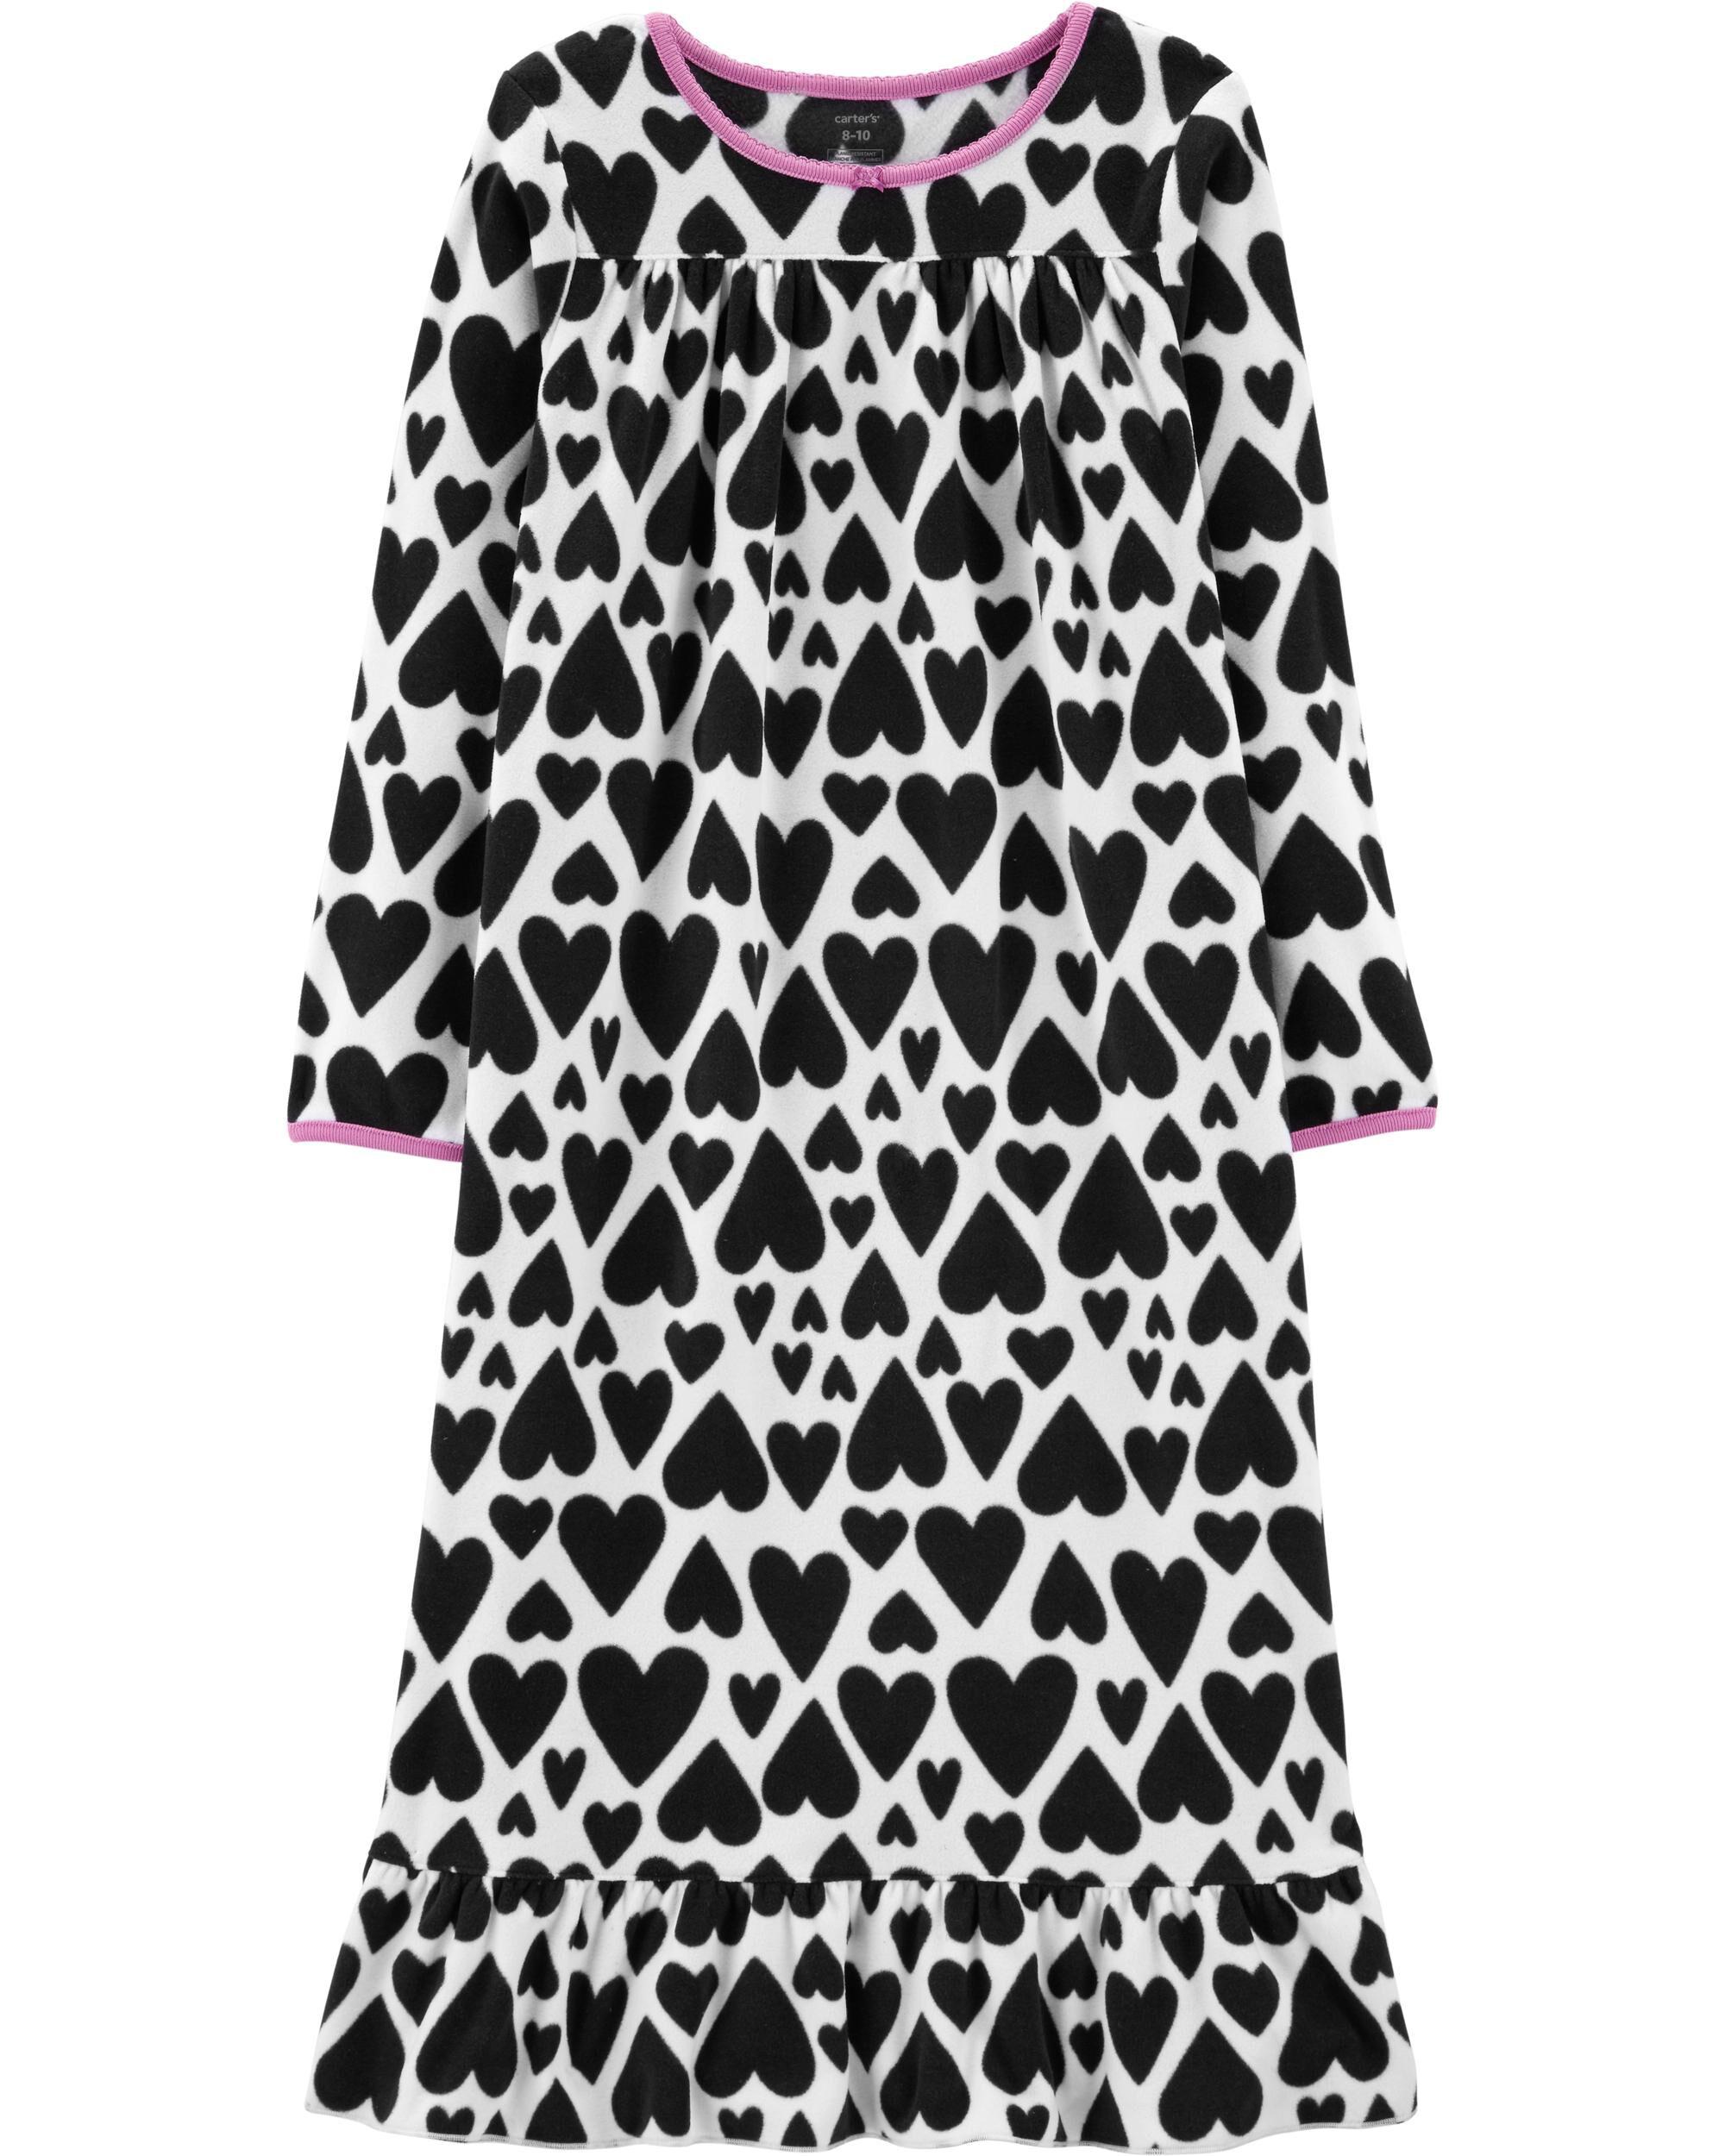 Heart Fleece Sleep Gown   Carters.com